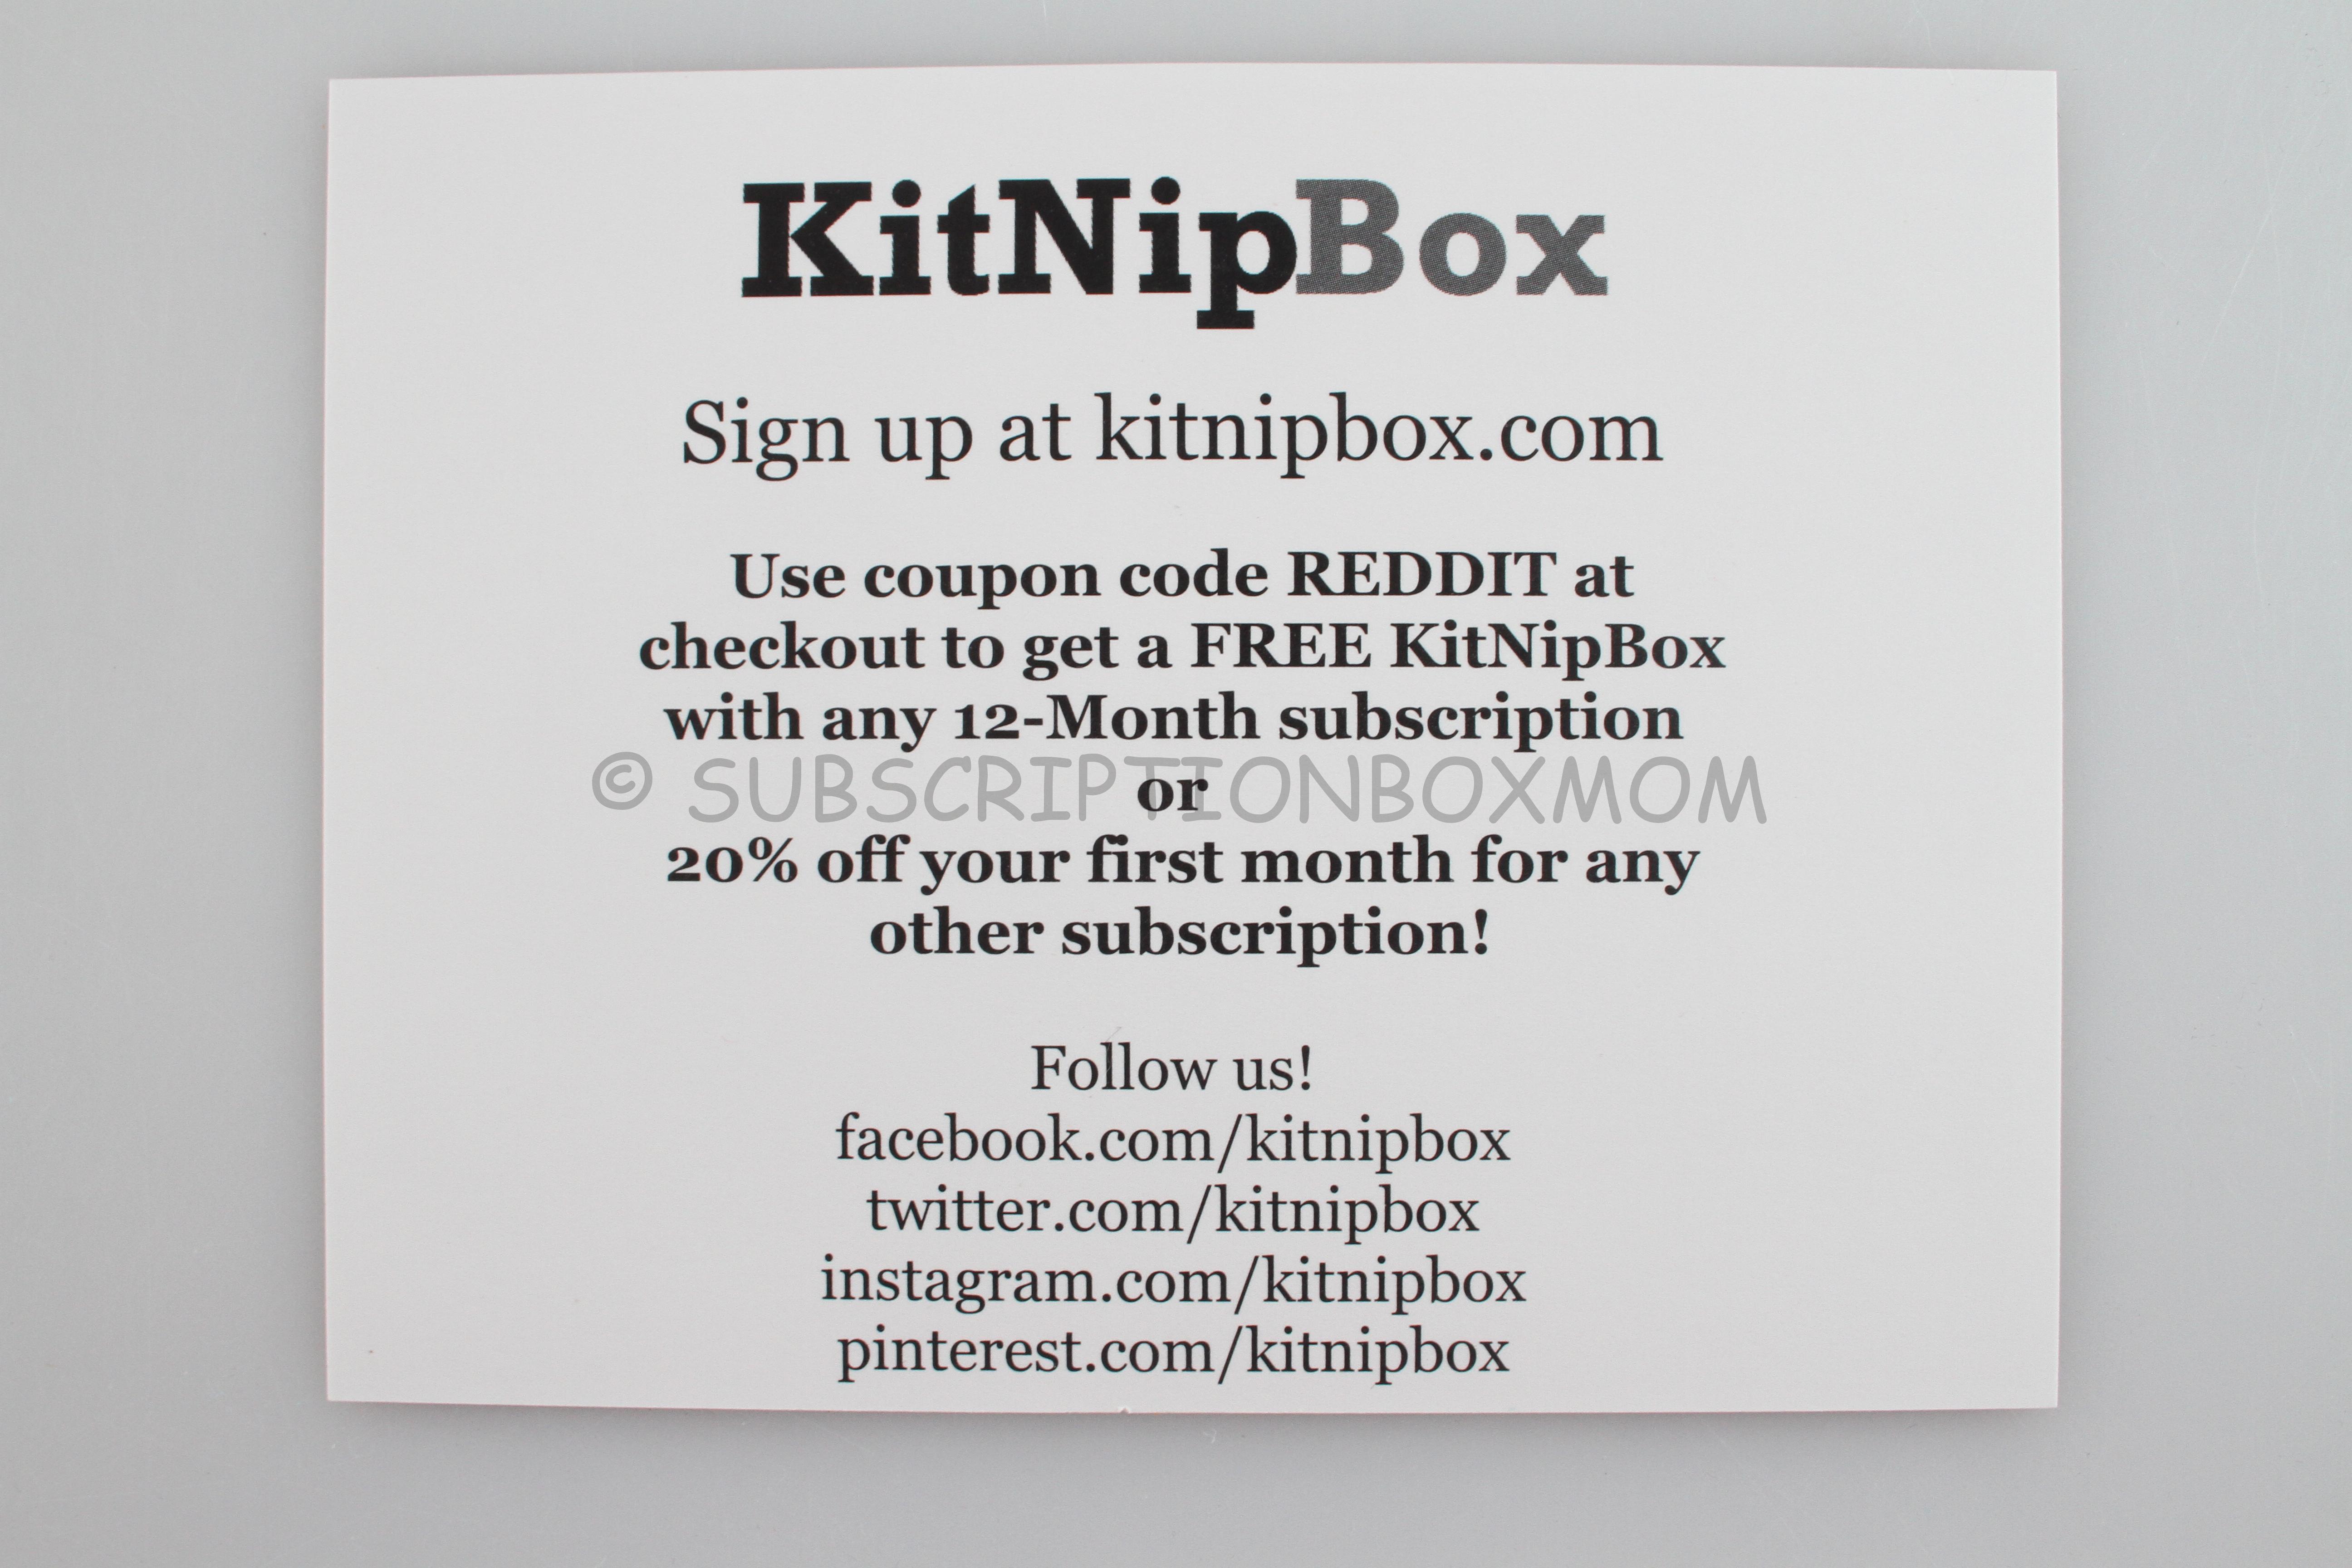 KitNipBox Special Edition on Reddit - Subscription Box Mom